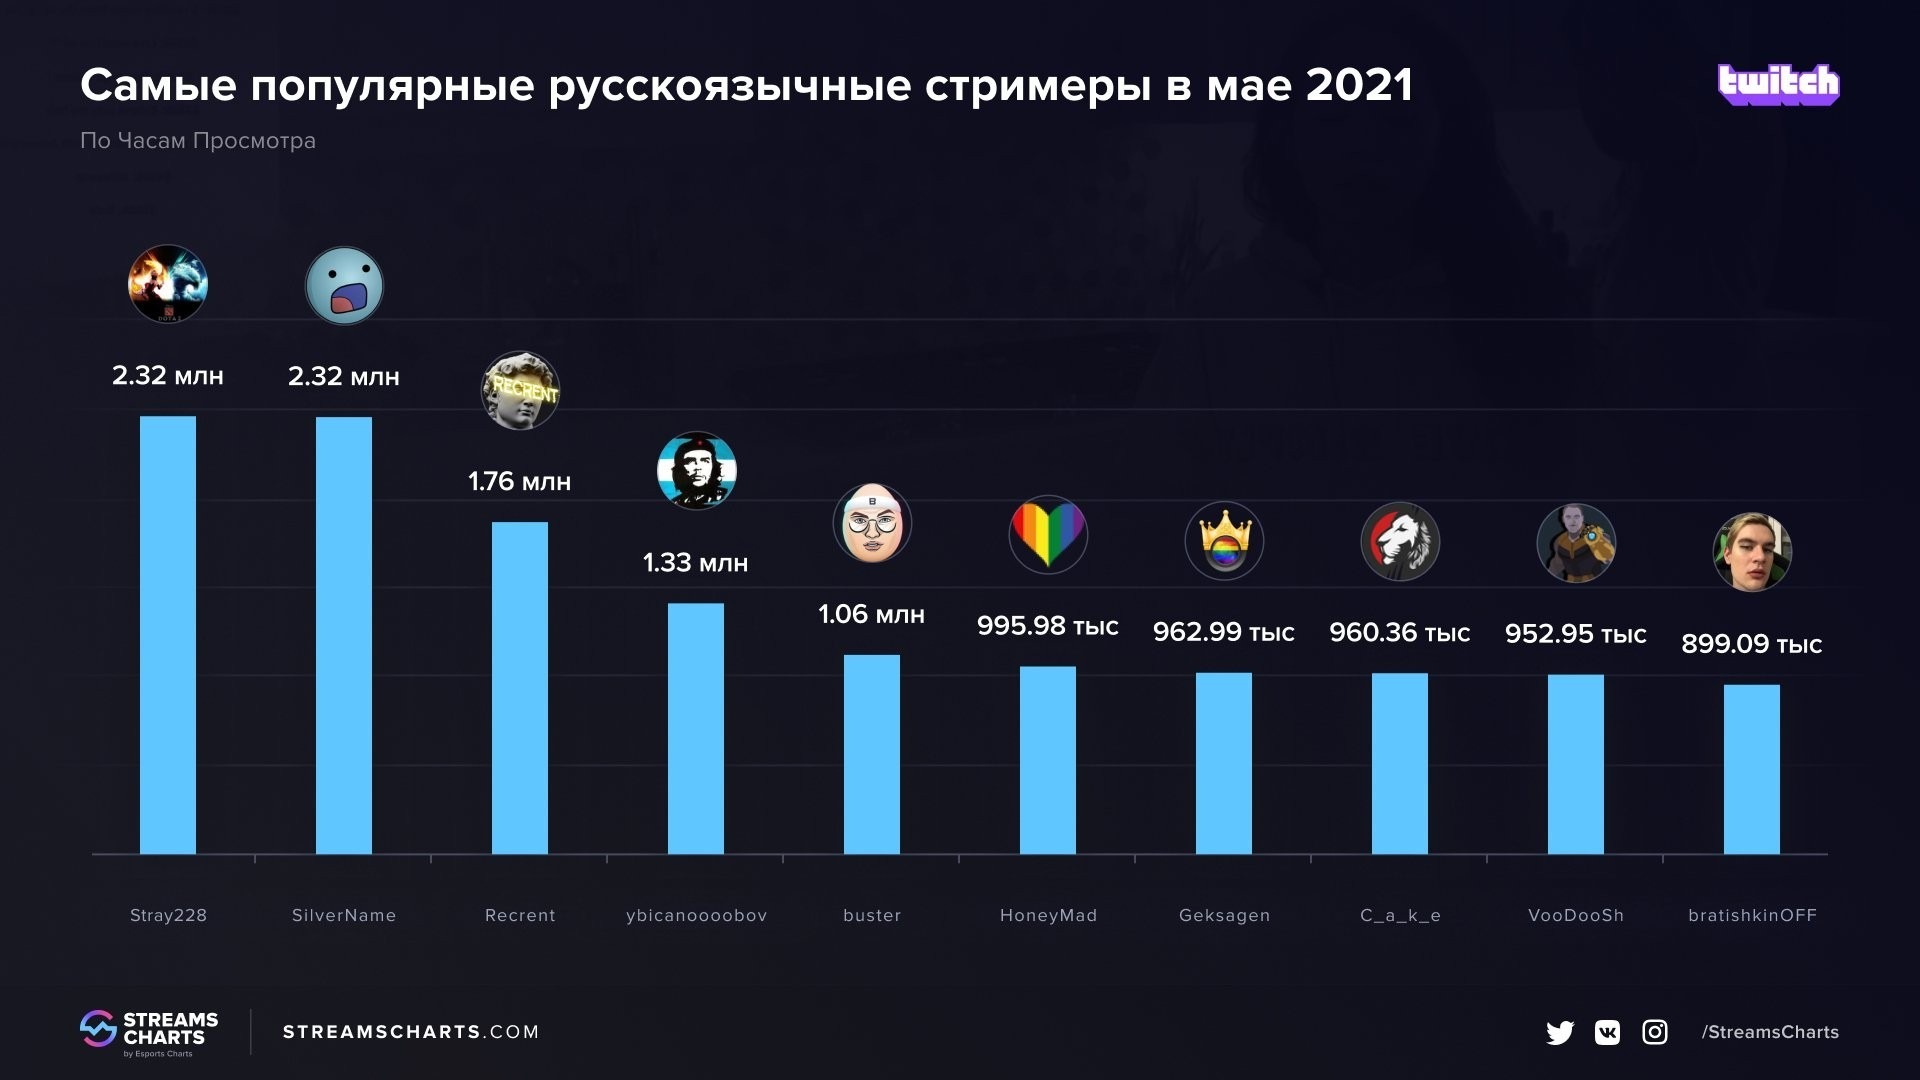 Stray228 стал самым популярным русскоязычным стримером мая на Twitch